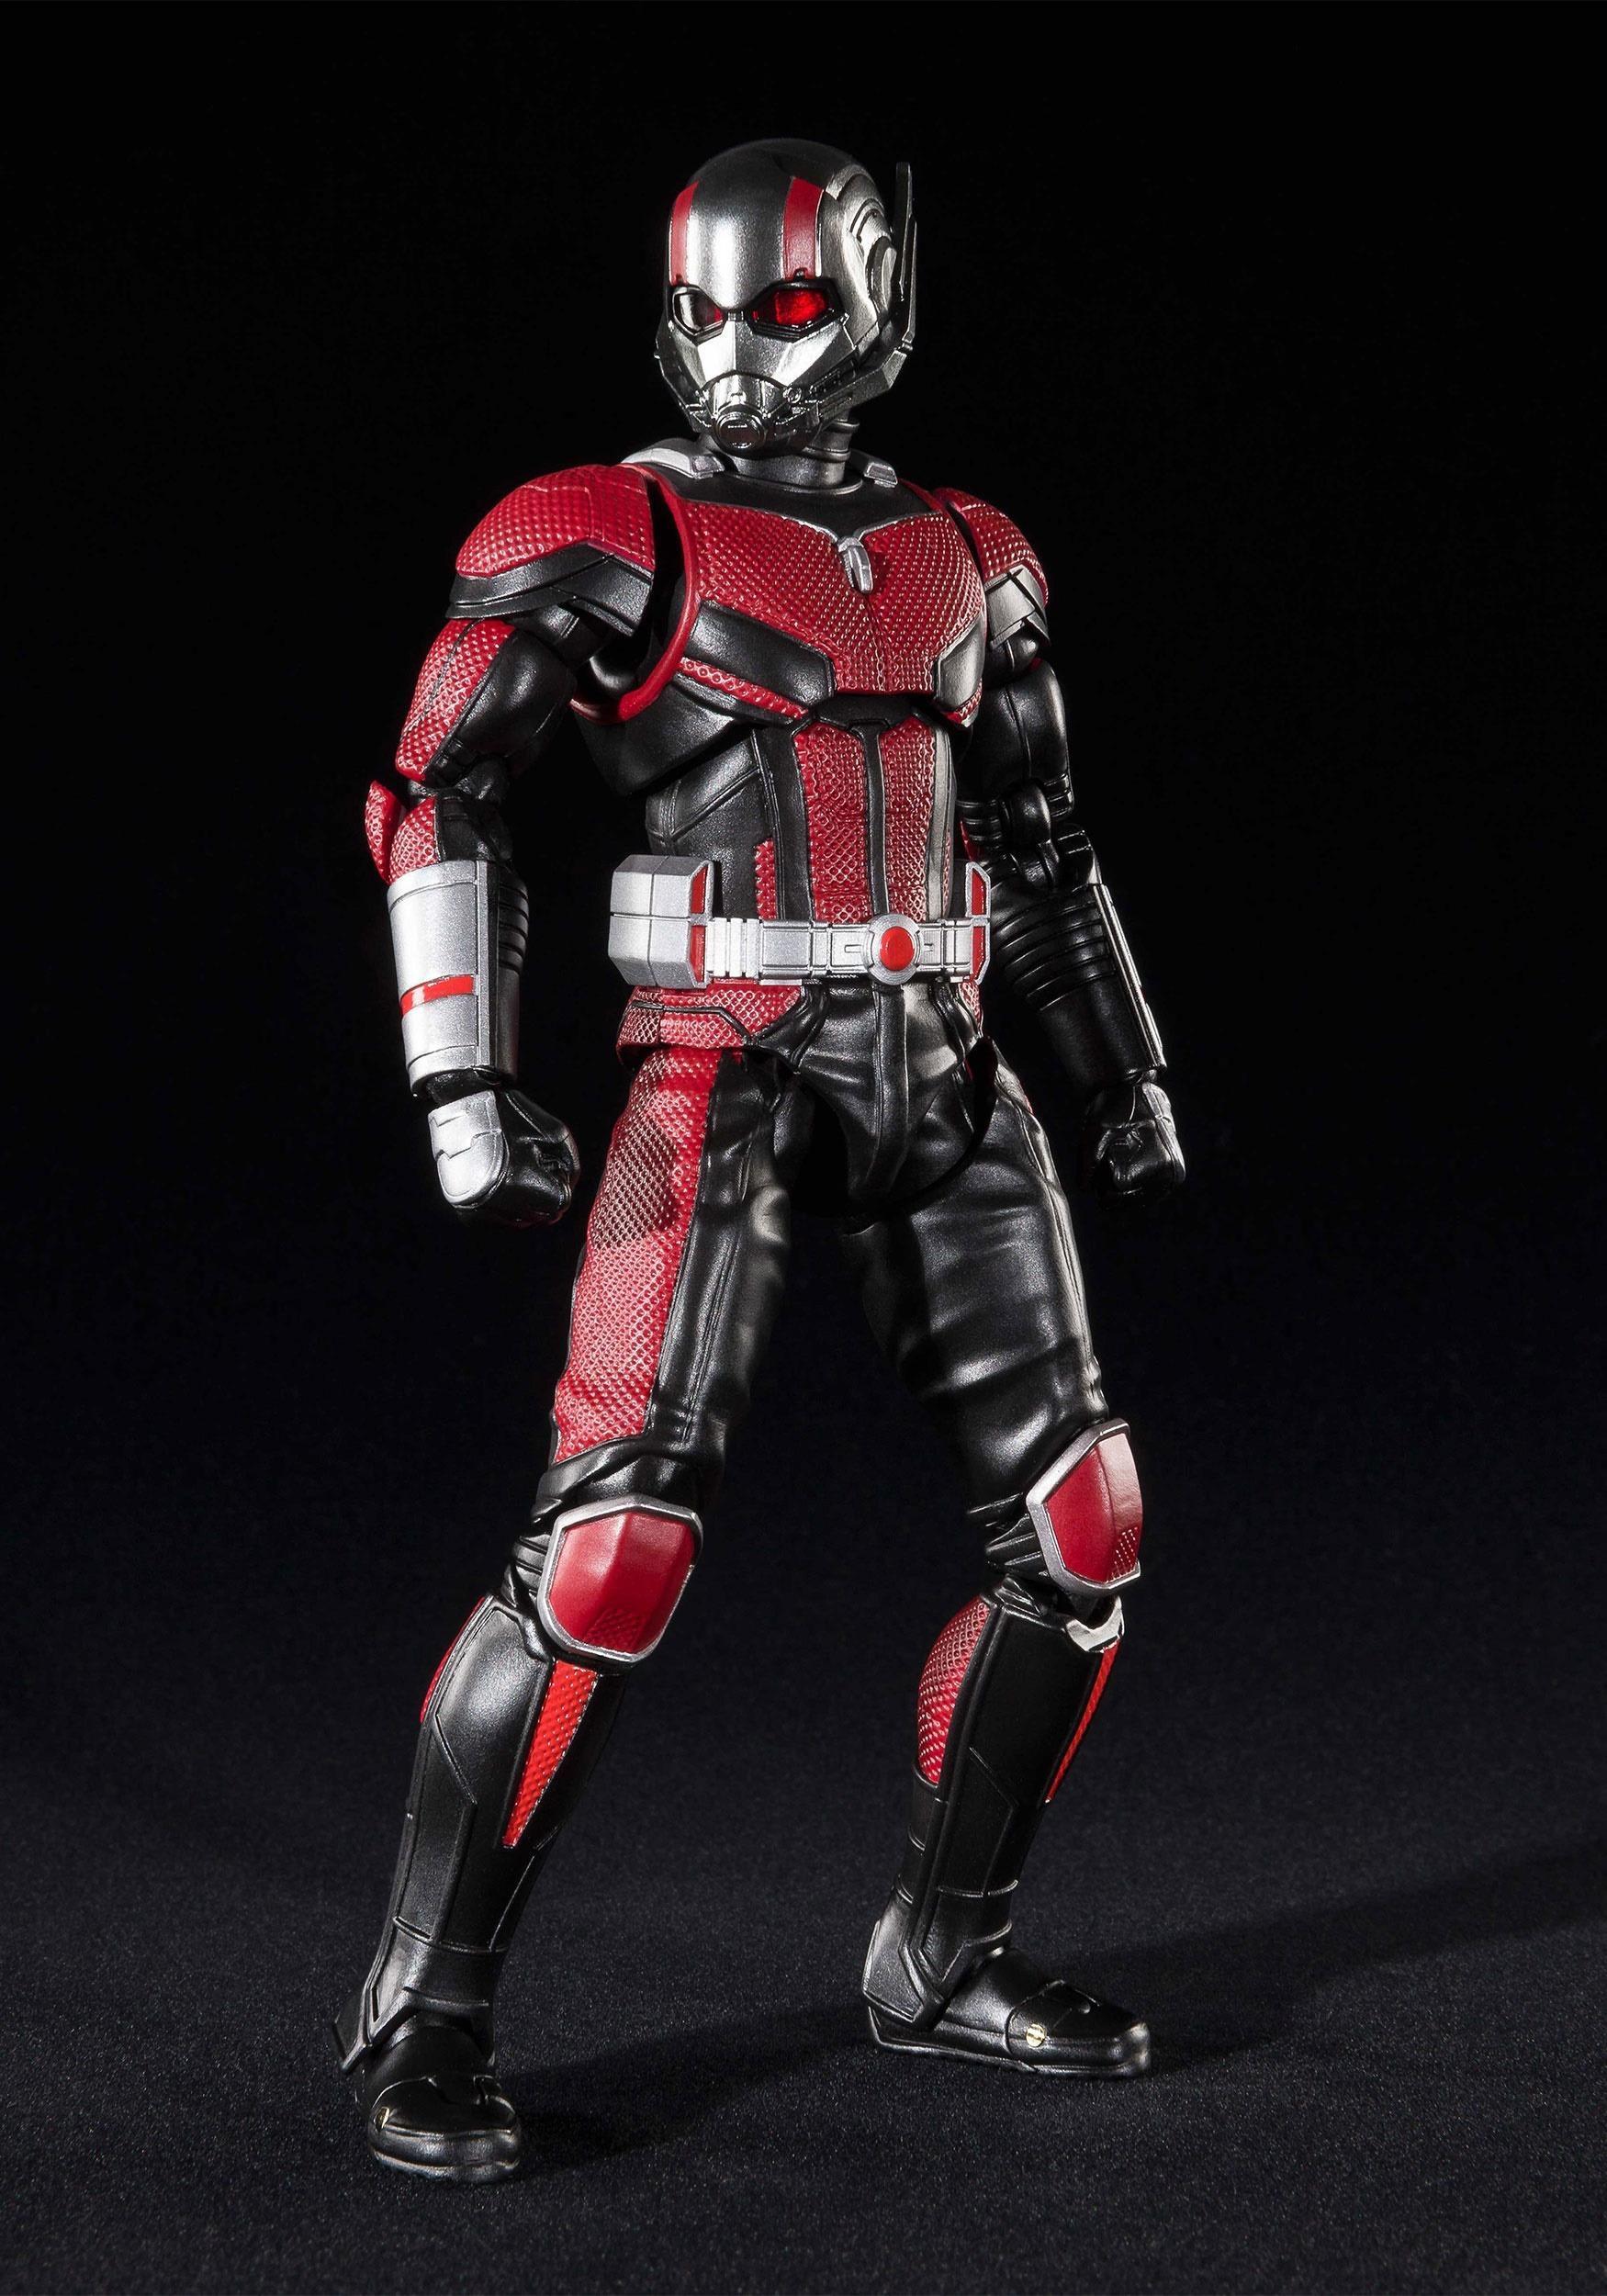 AntMan_&_Ant_Set_Bandai_SH_Figurarts_Superhero_Action_Figure